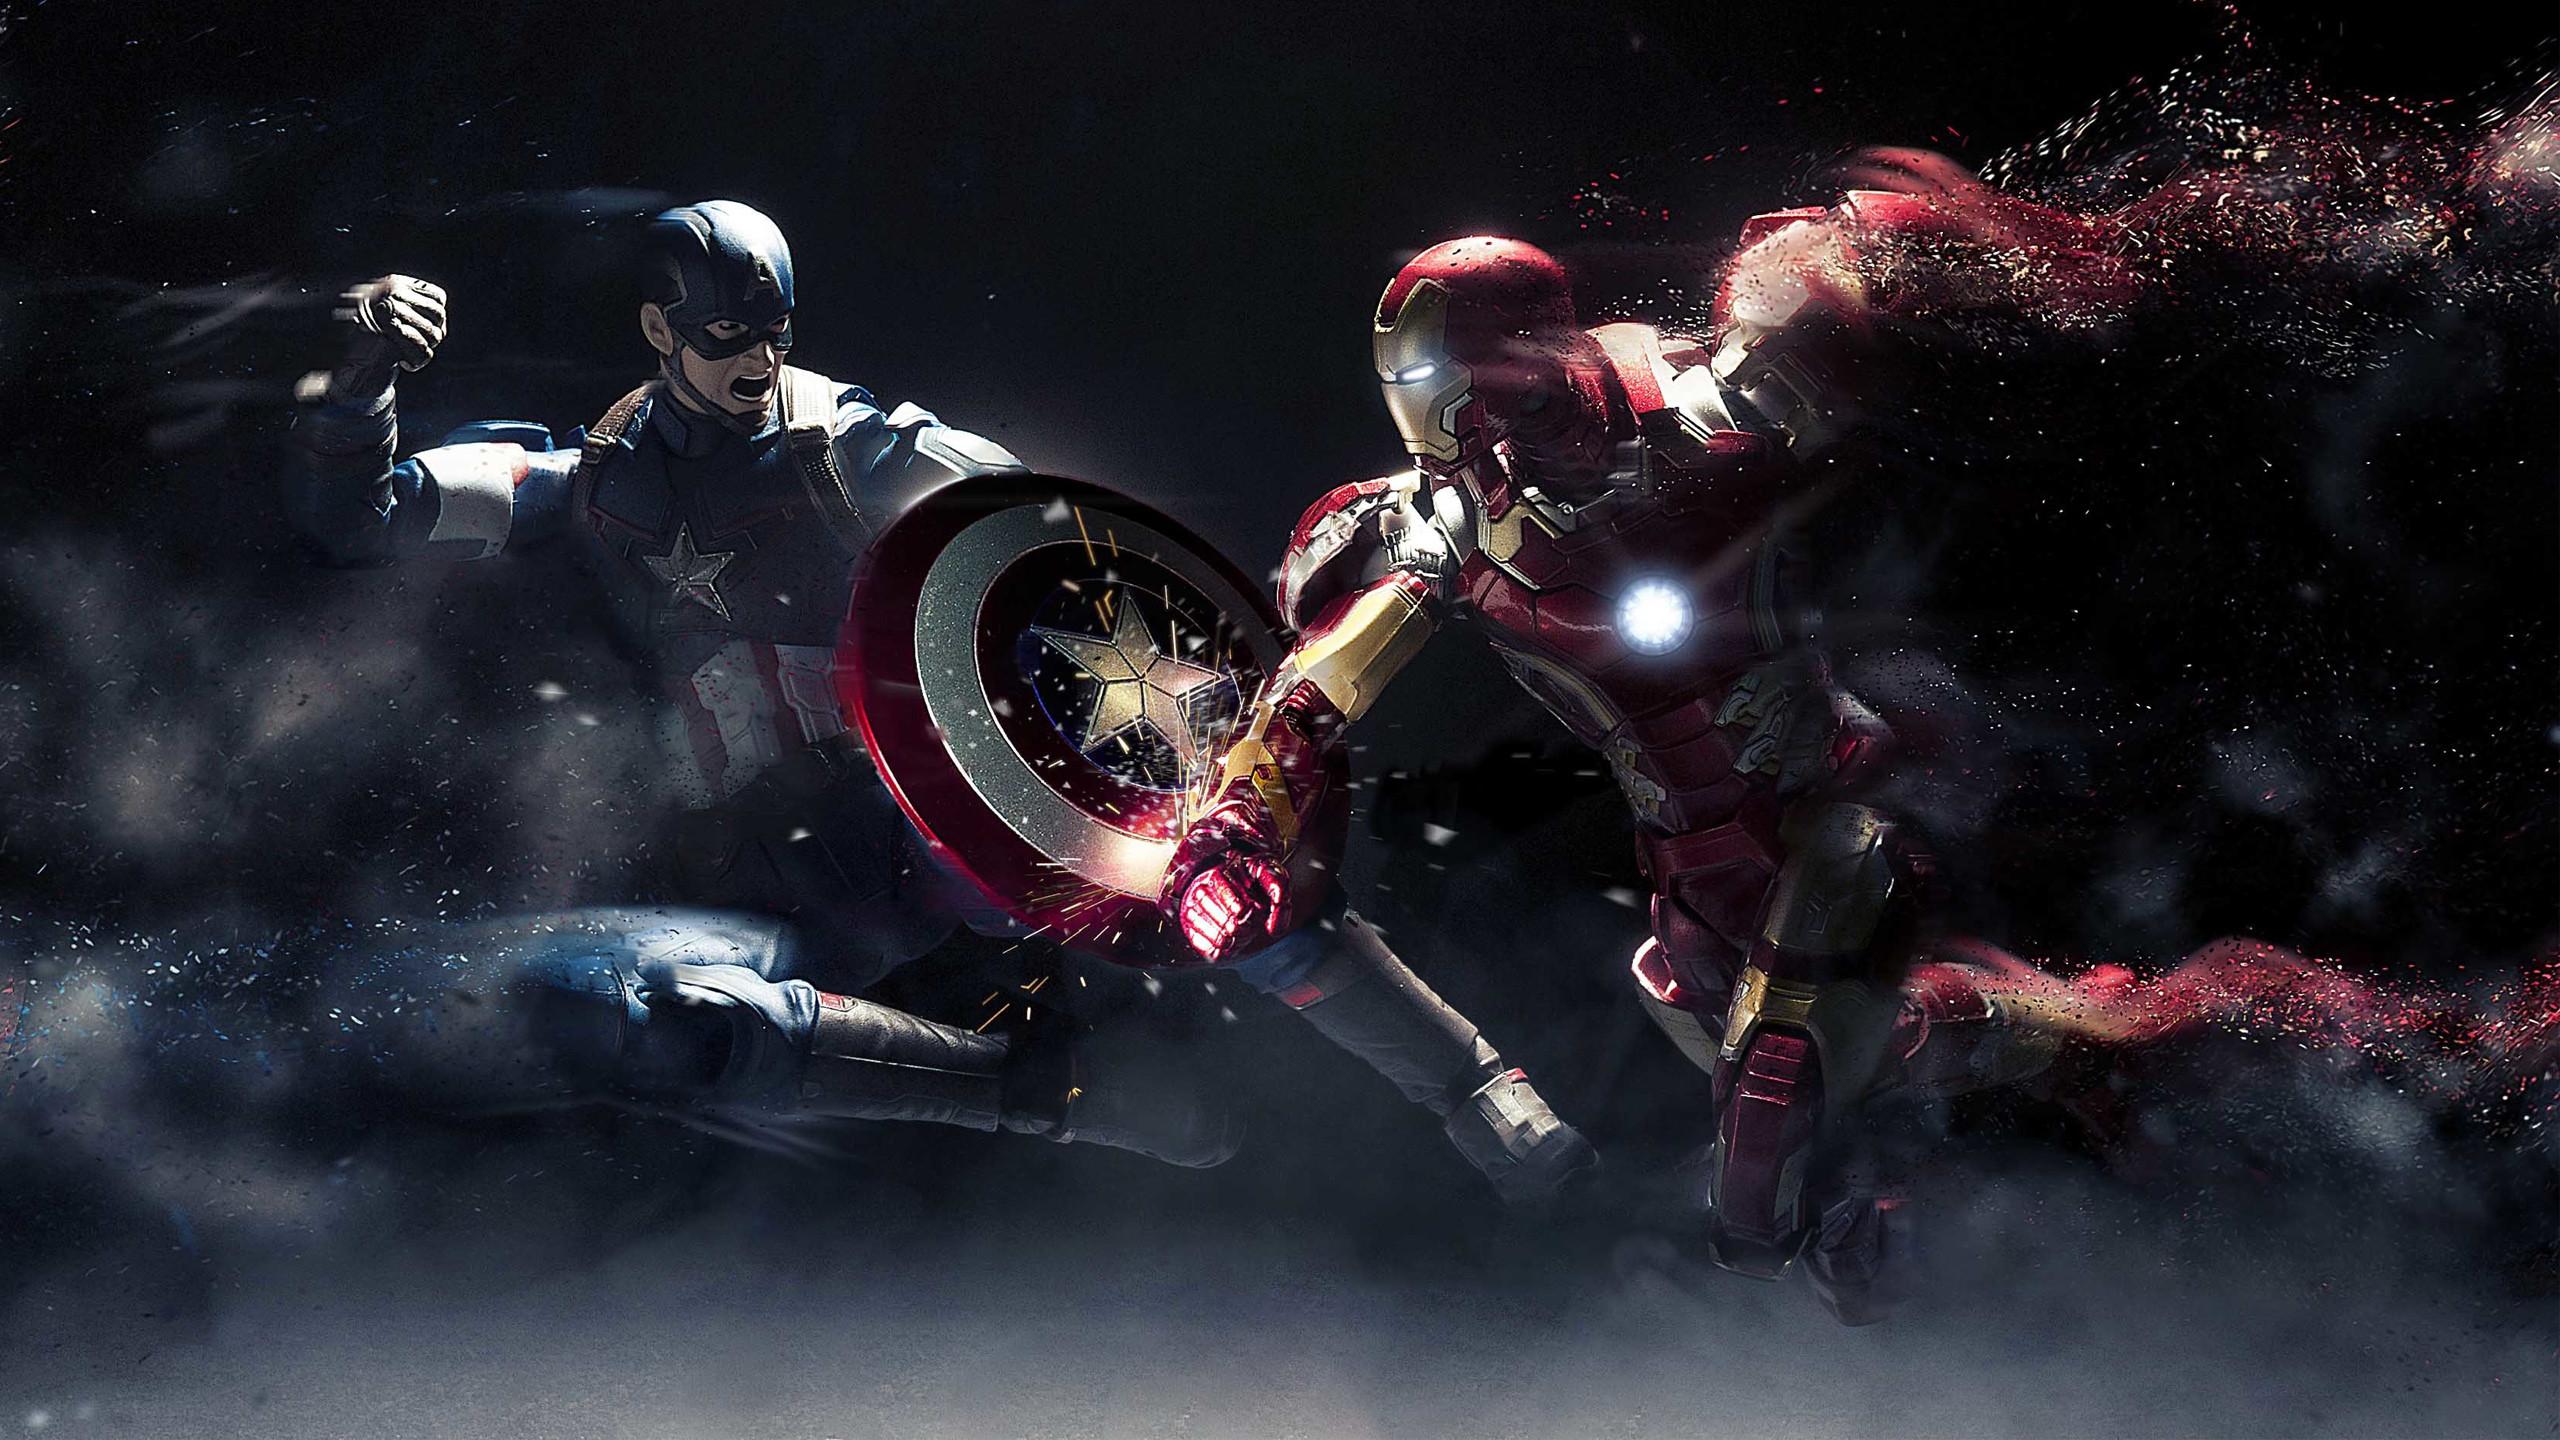 Marvel Civil War Wallpapers, New Marvel Civil War HDQ Wallpapers